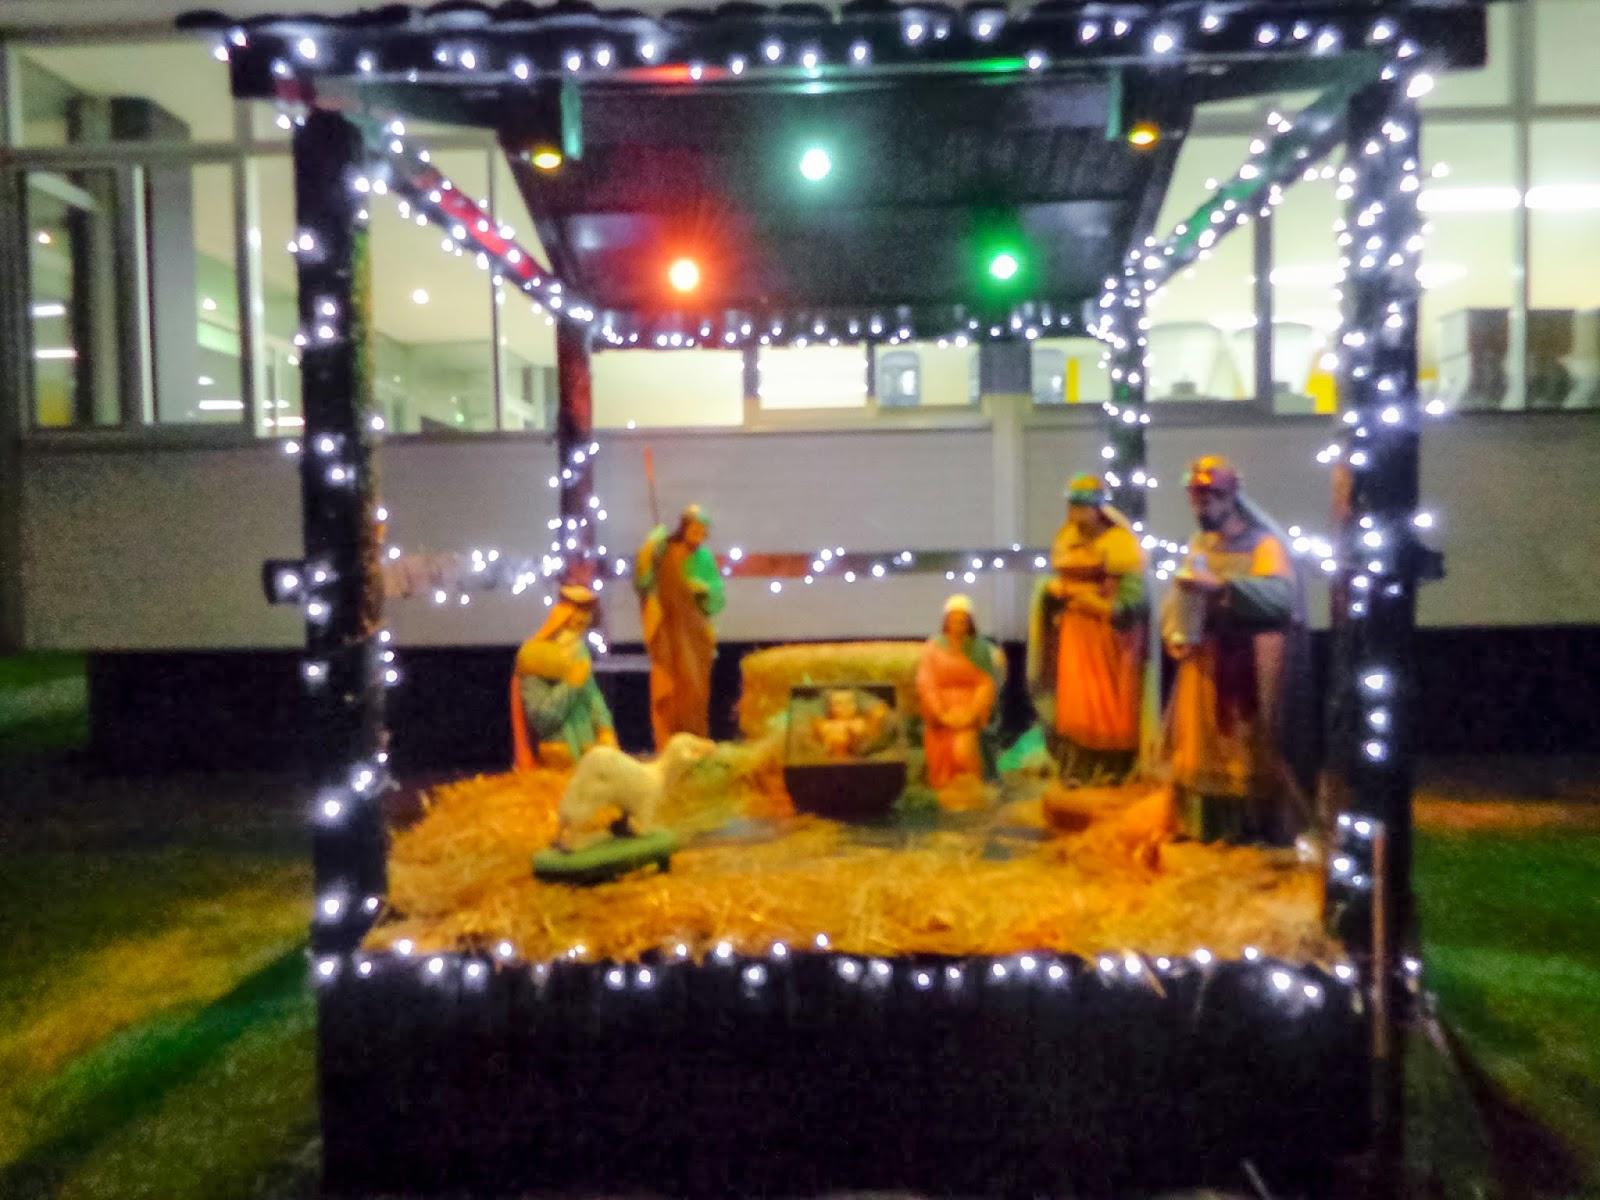 CCM MTC Mexico Nativity-Christmas in Mexico / CCM Natividad Navidad en México